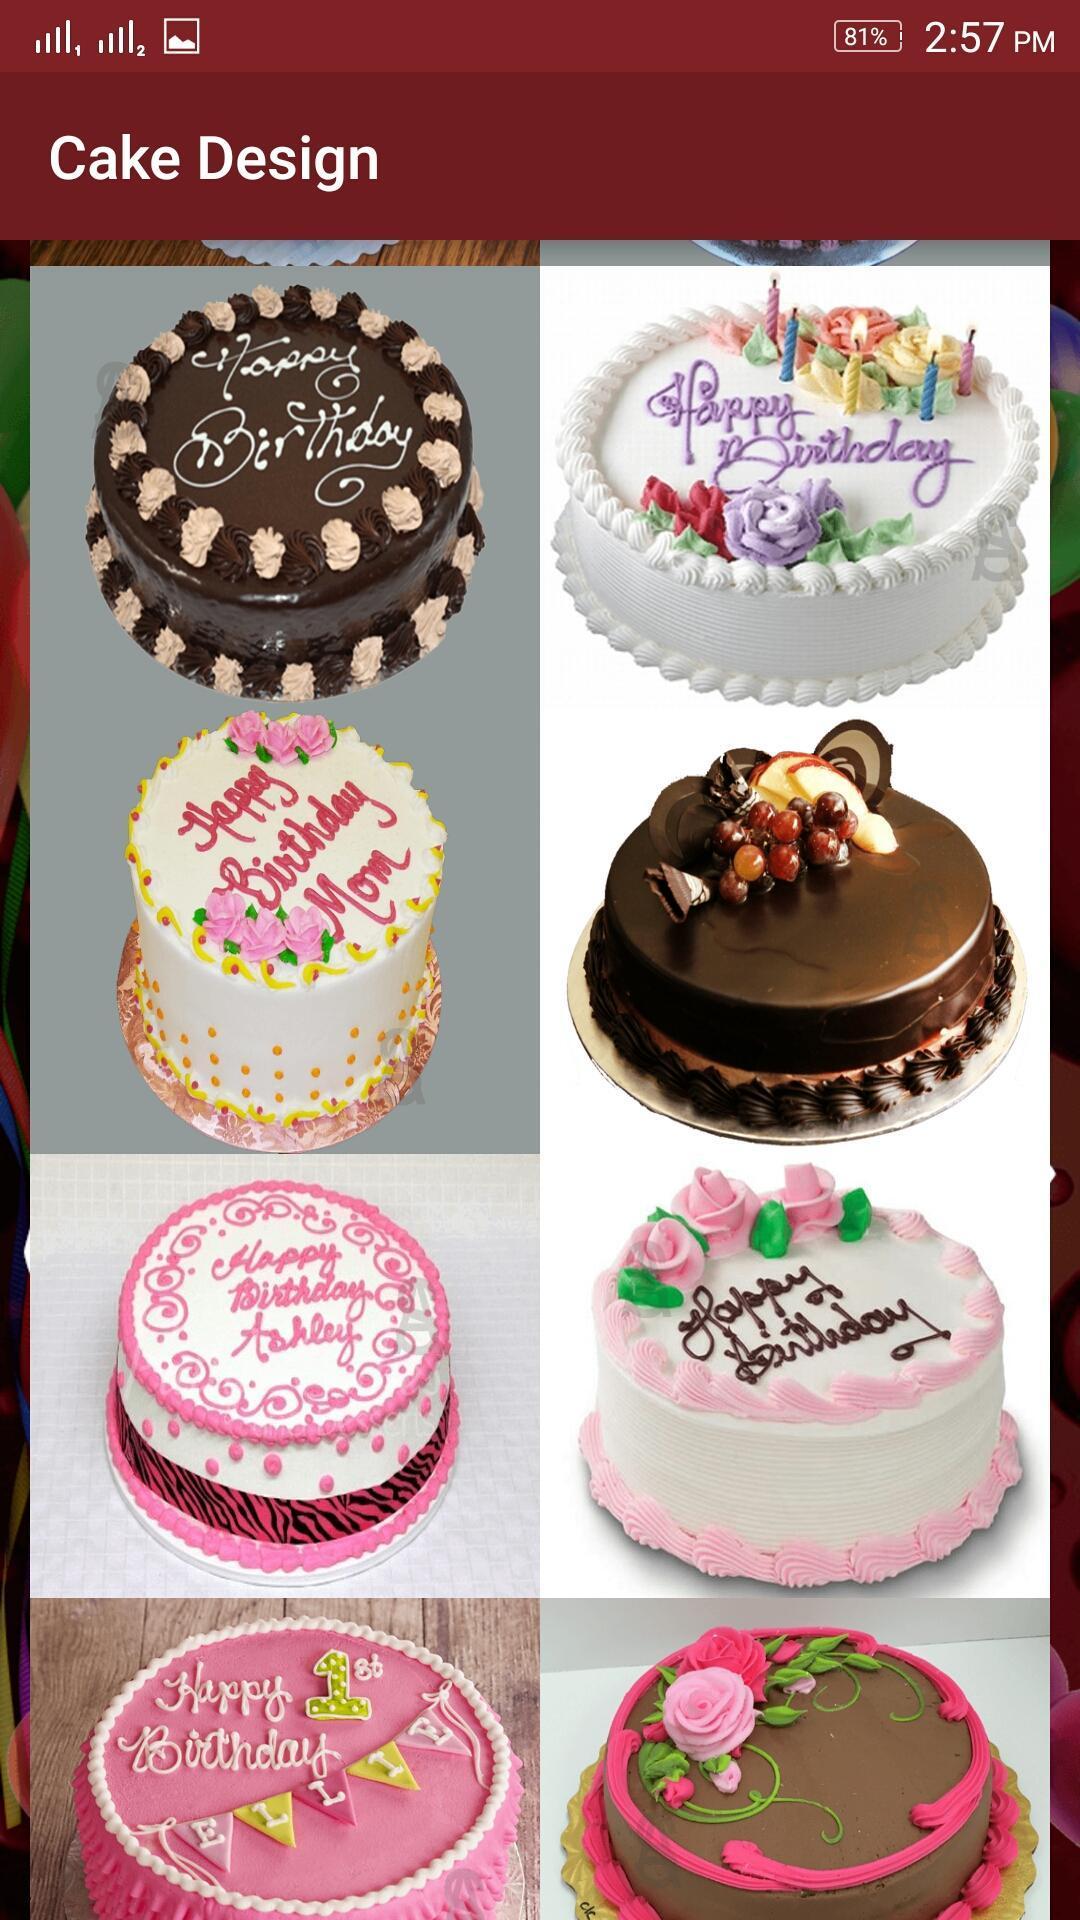 Birthday Cakes Designs- Round cakes poster